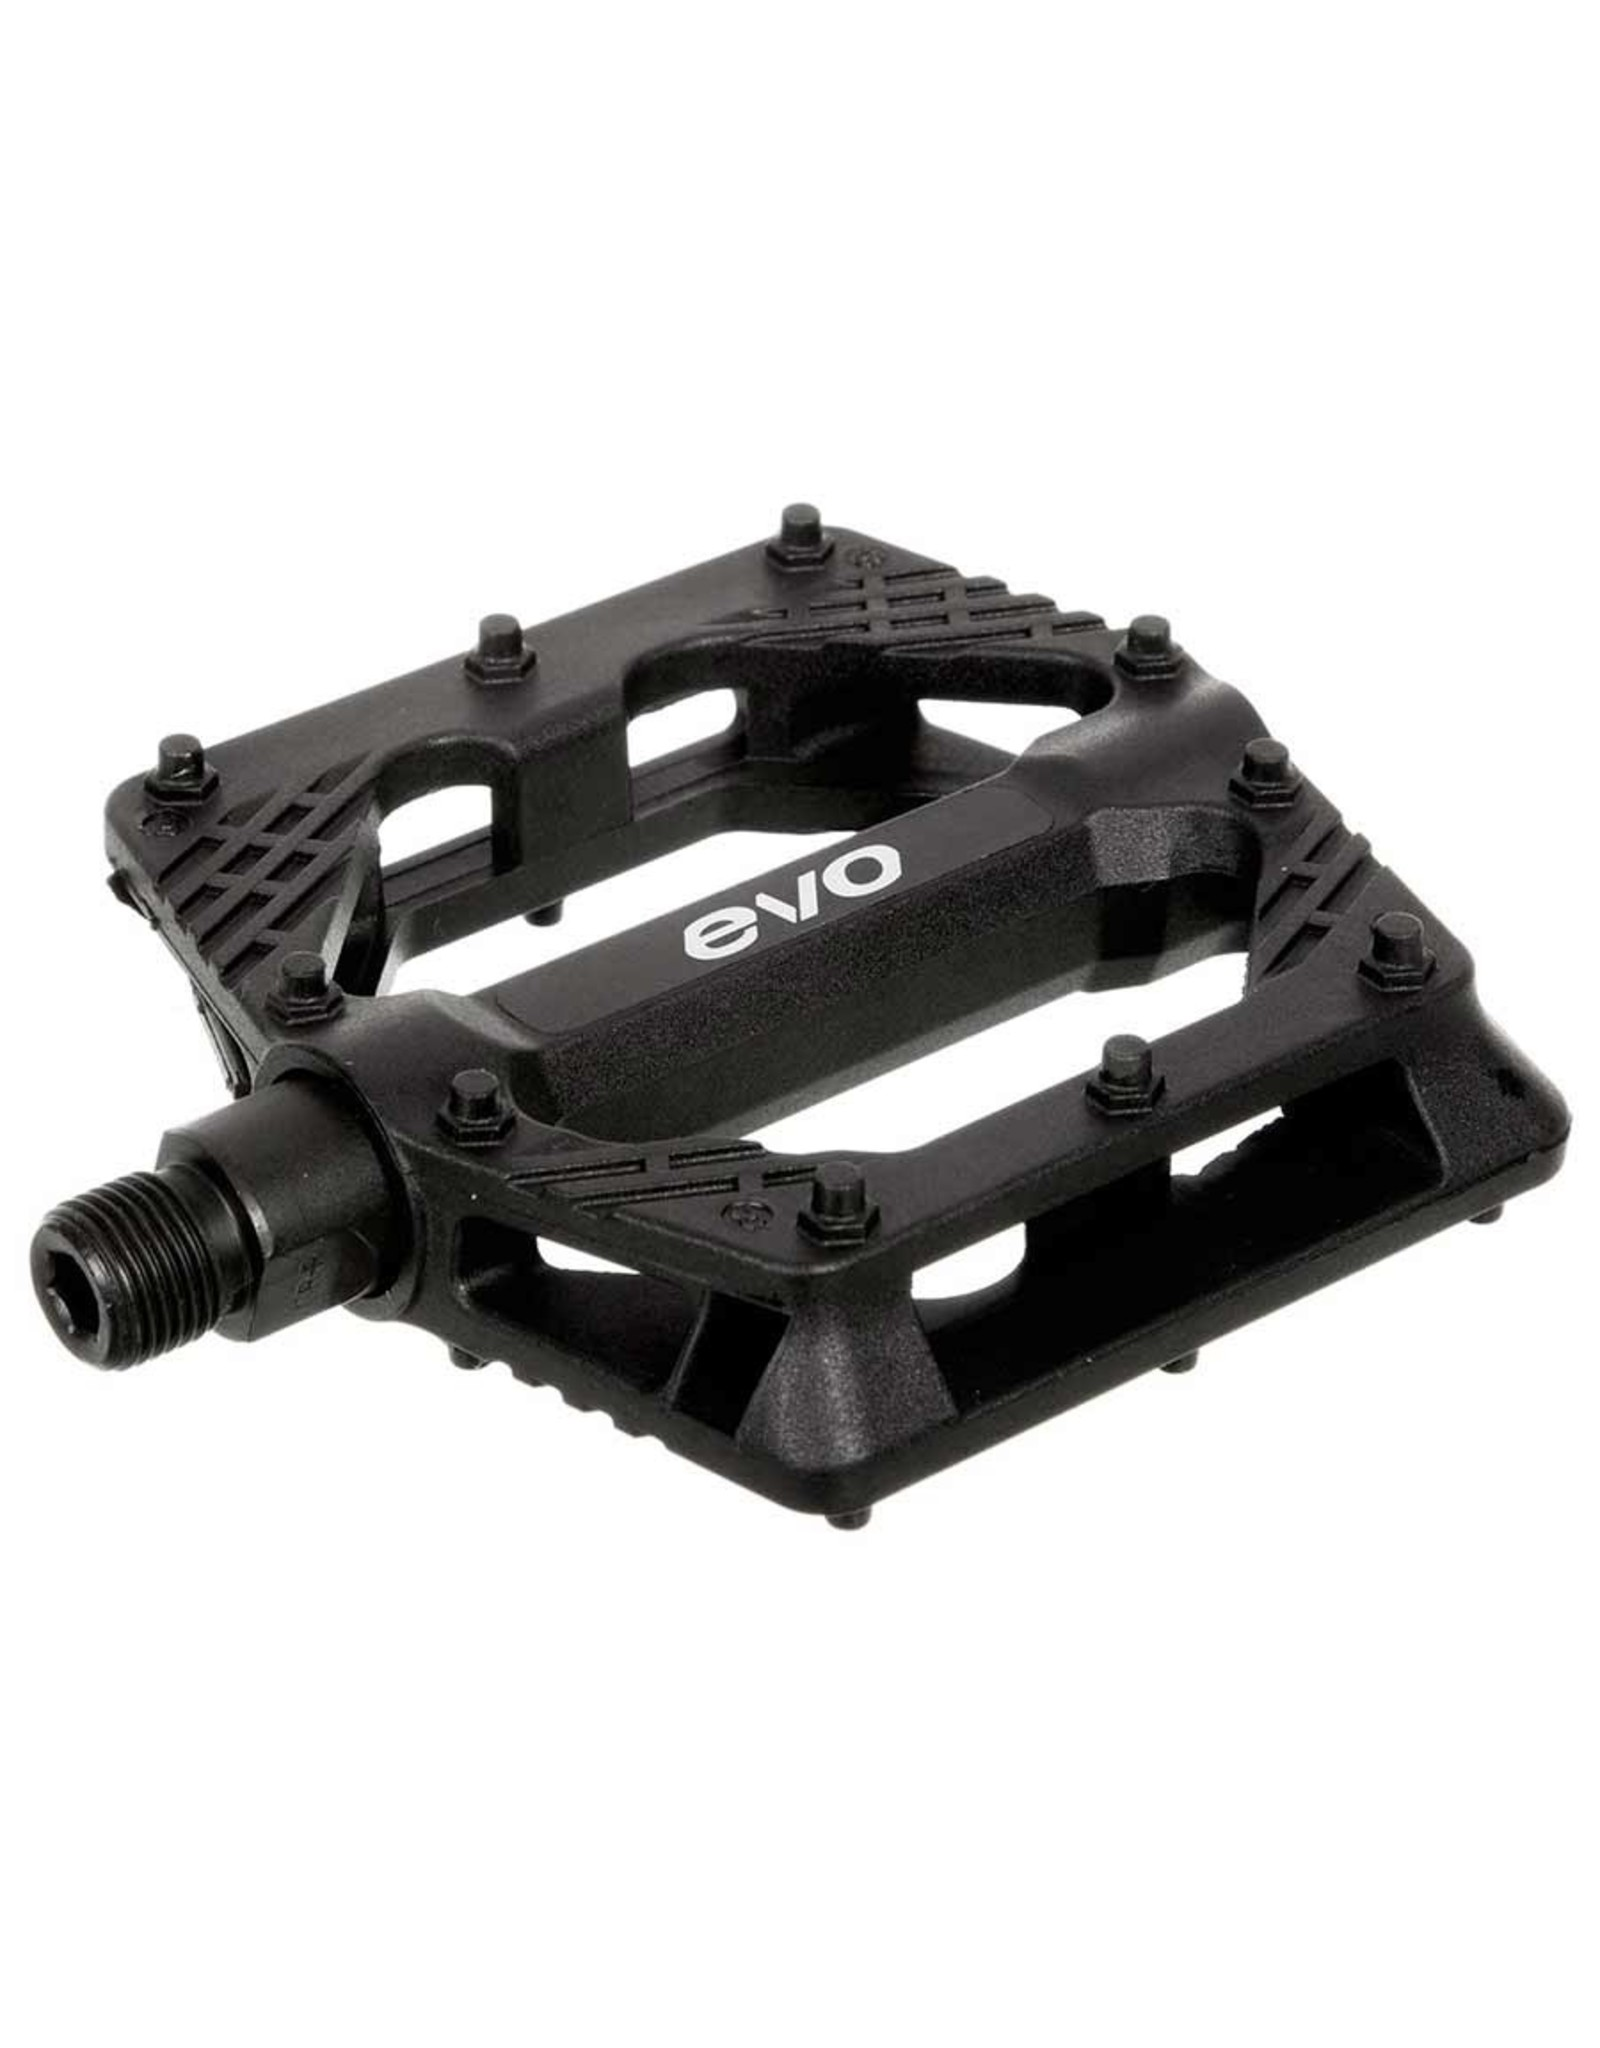 EVO Freefall Sport, Platform Pedals, Body: Nylon, Spindle: Cr-Mo, 9/16'', Black, Pair